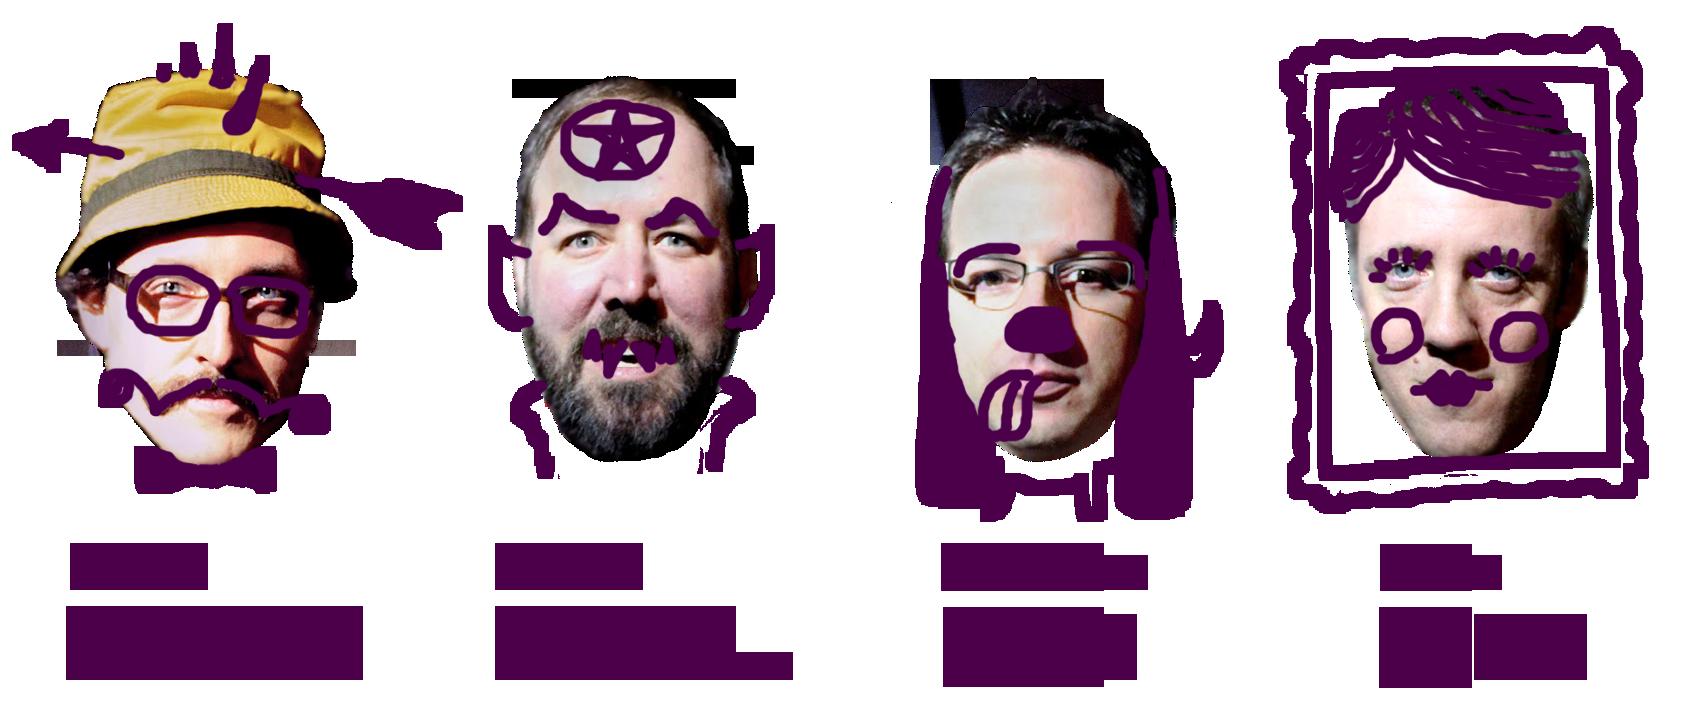 MATT BRENT JORDAN TOM   vox, guitars, keys guitars, vox bass, vox drums  ss#: 416-37-9132 size: women's XL pin #: 1234 veggies: no